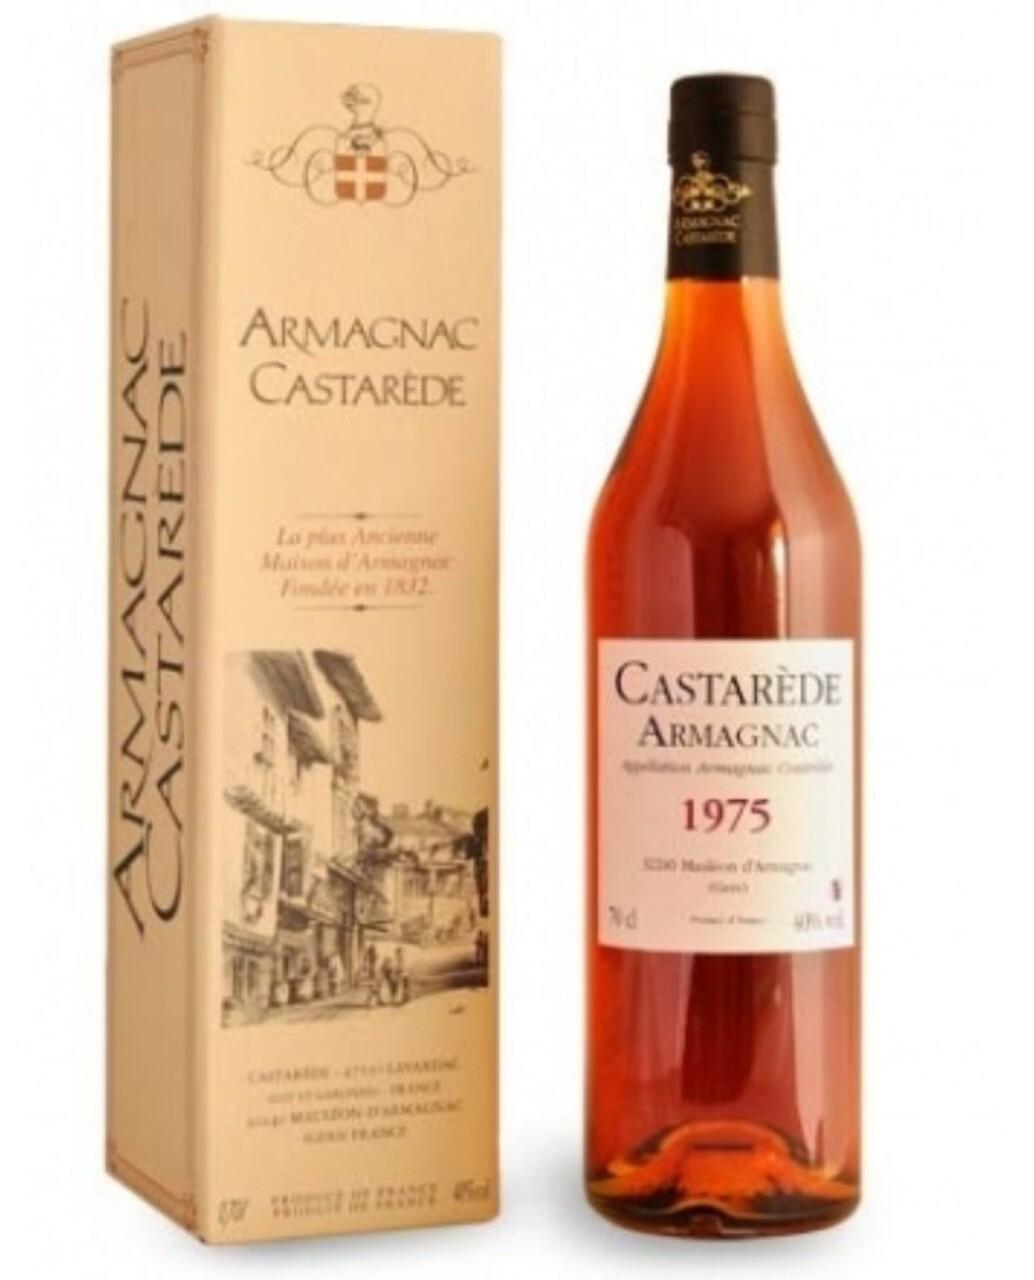 ARMAGNAC CASTAREDE 1975